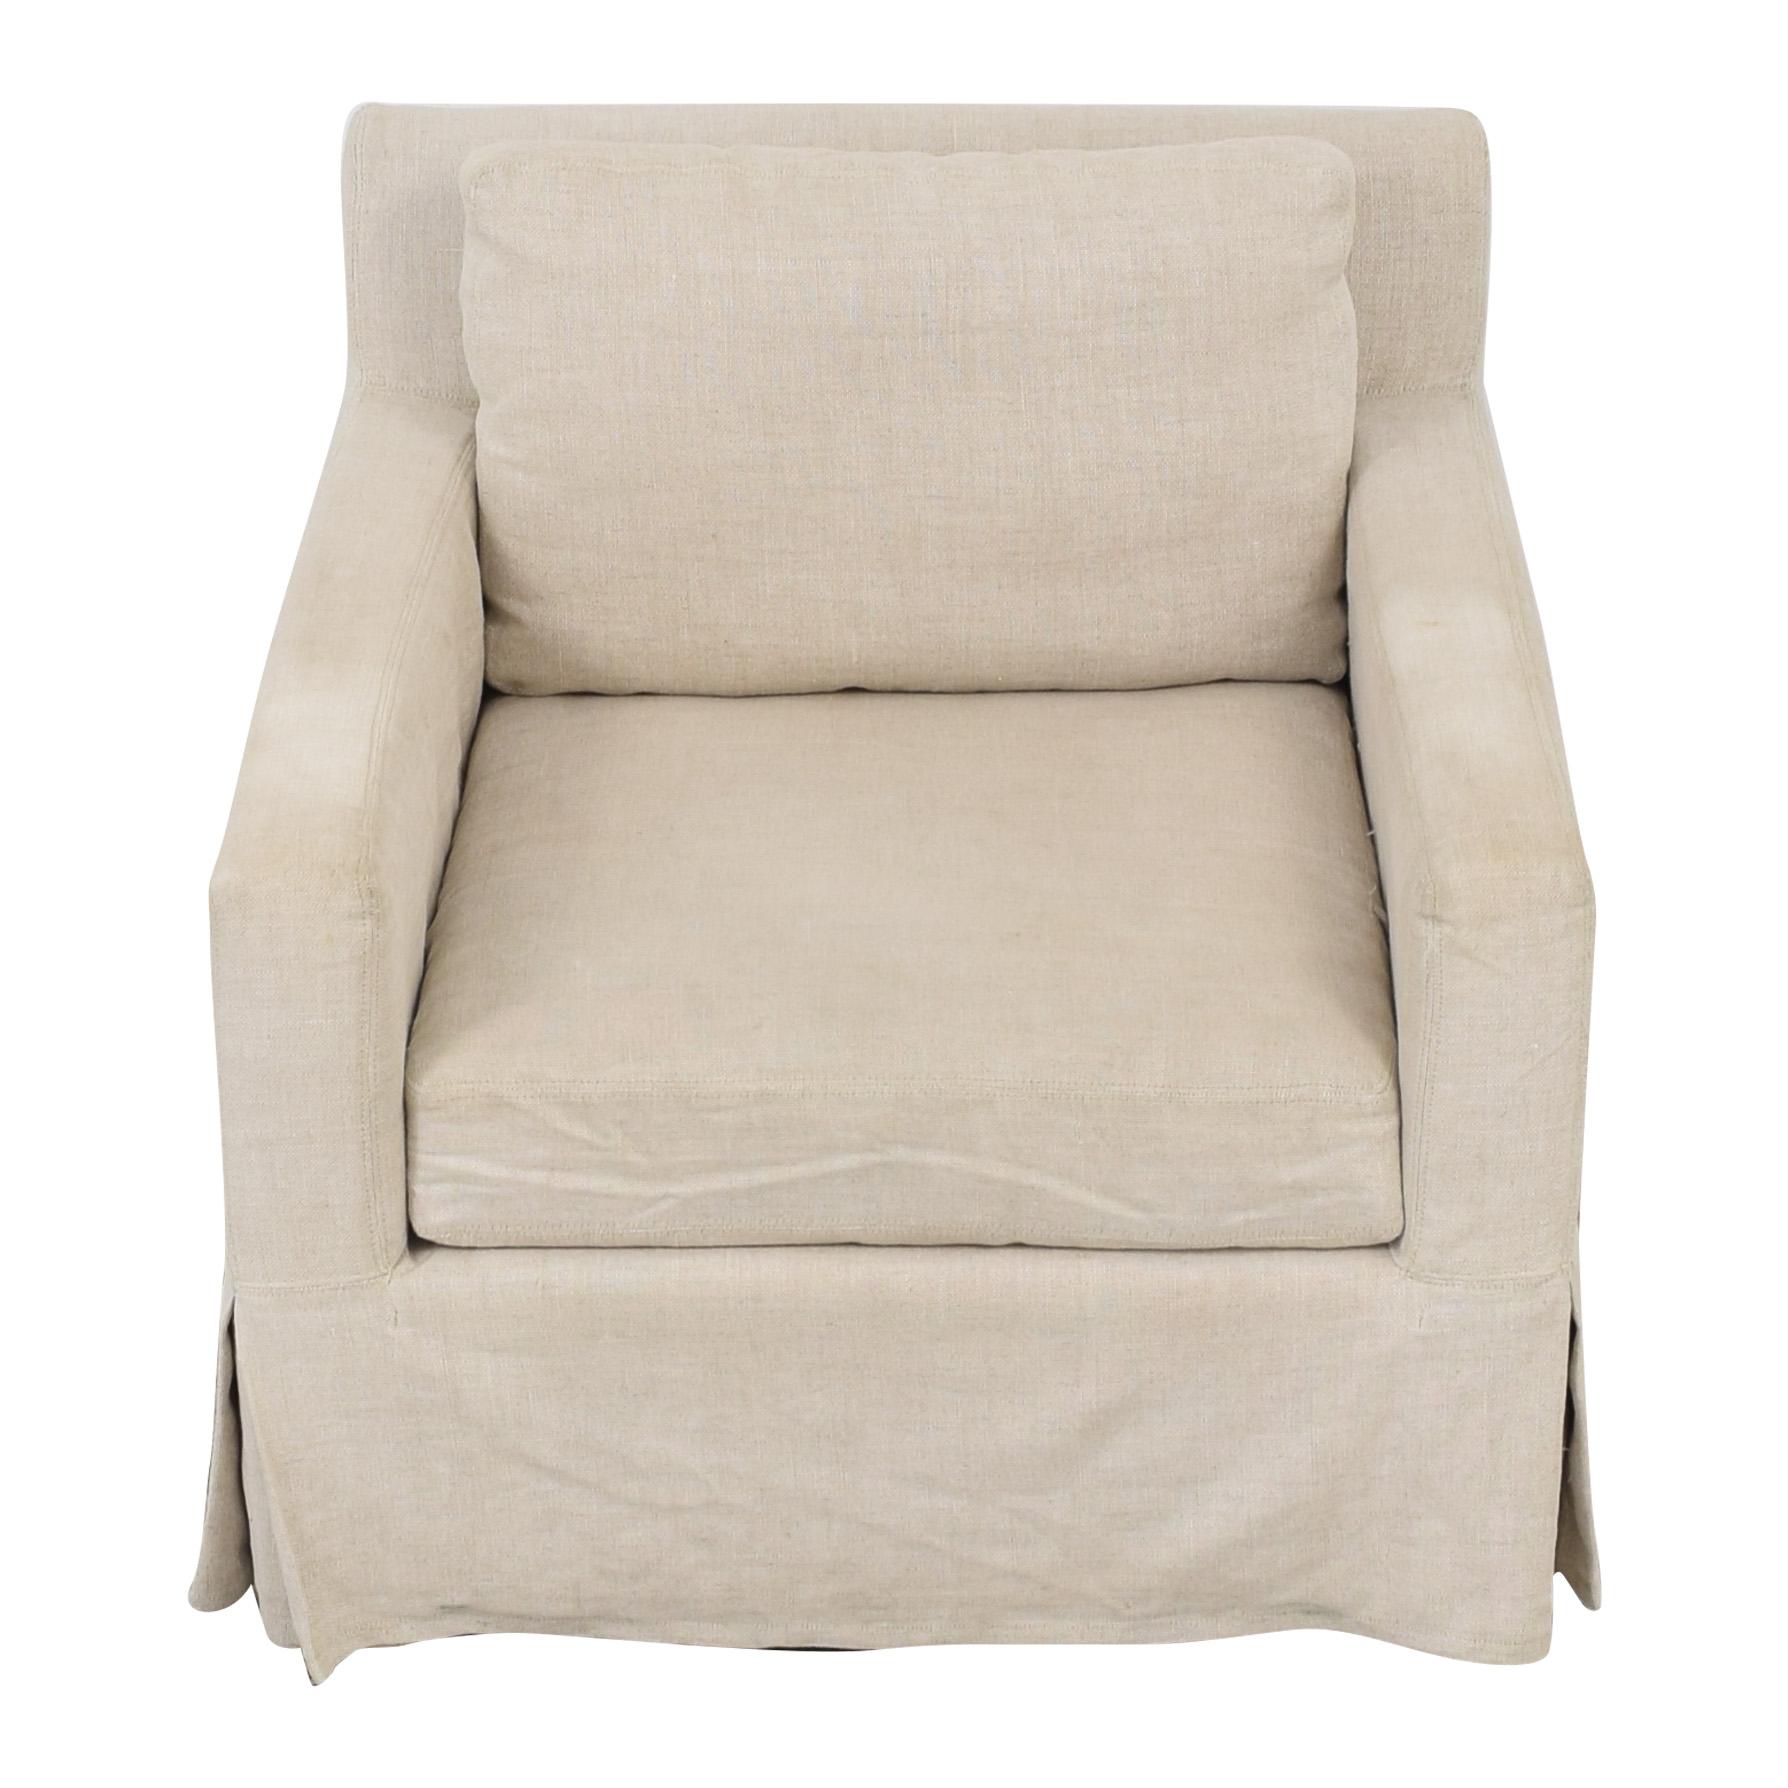 shop Restoration Hardware Belgian Linen Track Arm Slipcovered Chair Restoration Hardware